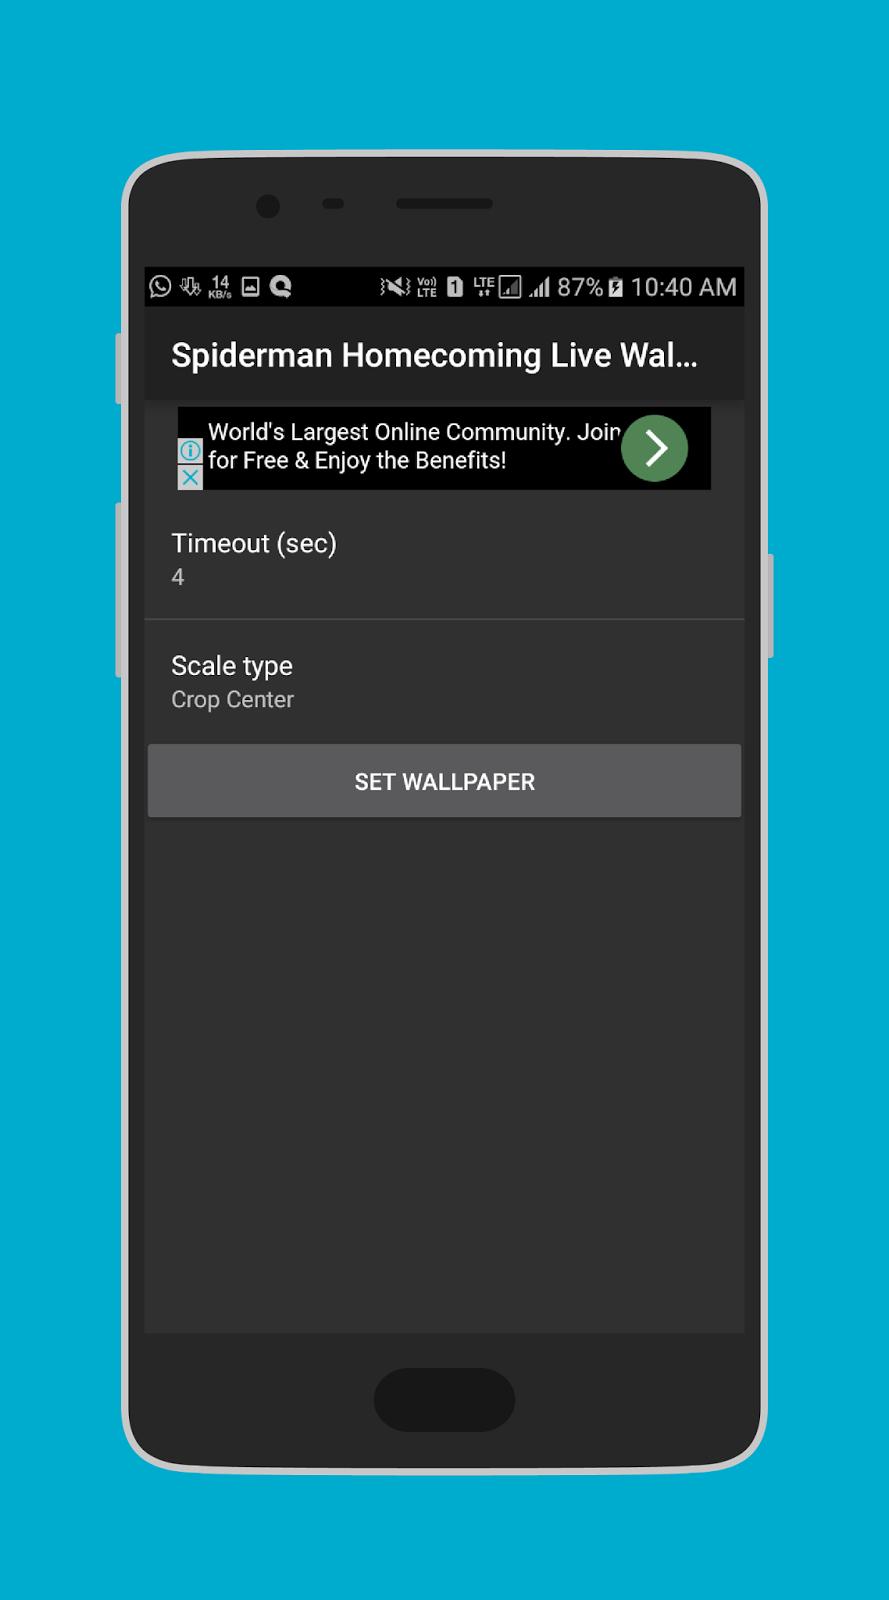 Free Download Spiderman Homecoming Live Wallpaper 3d - Smartphone - HD Wallpaper